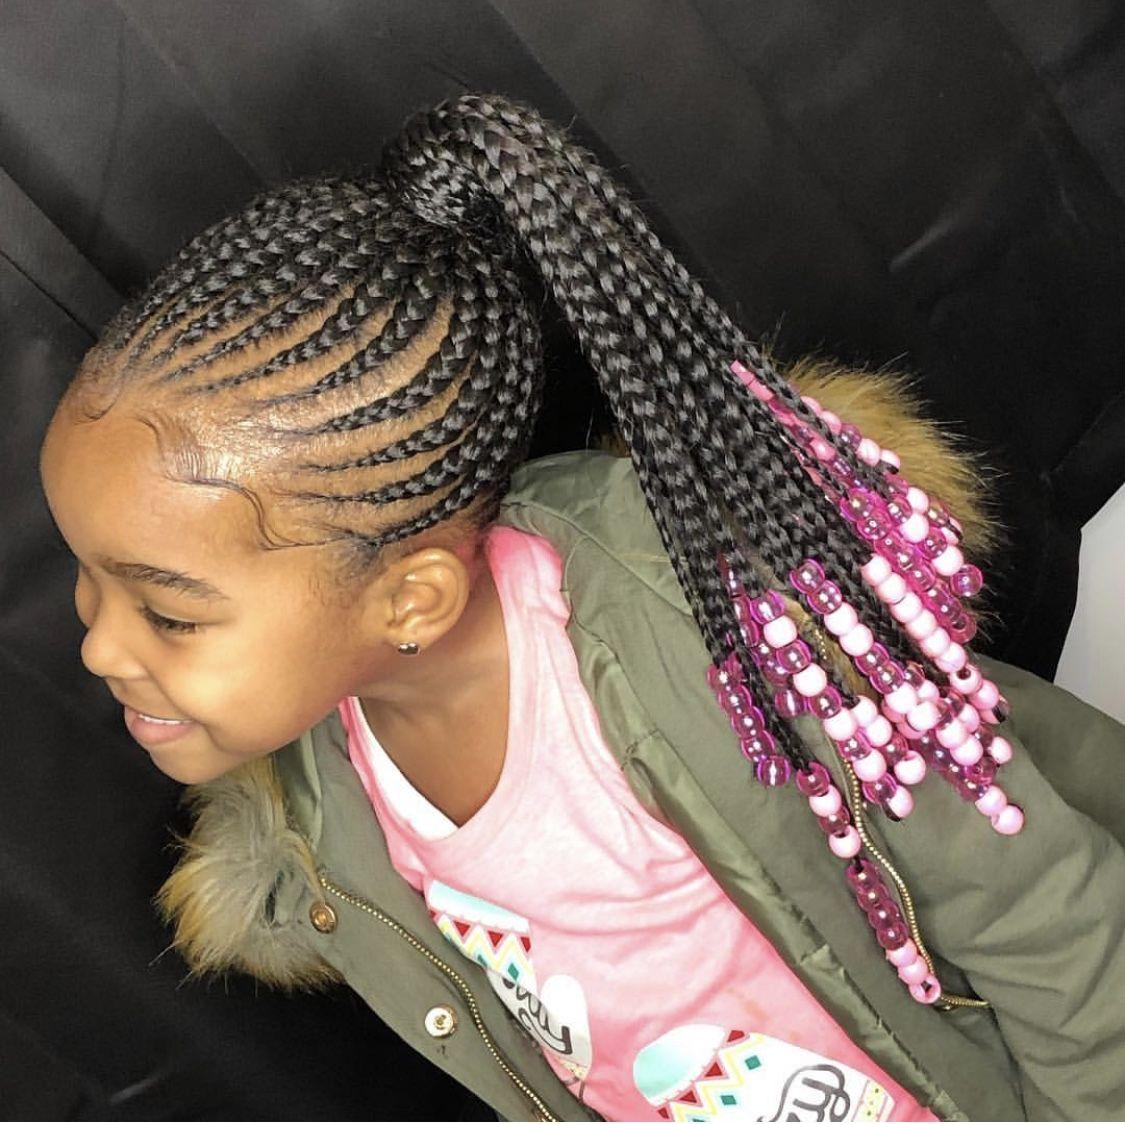 Pin By Tee Gwallaa On Hair Styles Hair Styles Girls Hairstyles